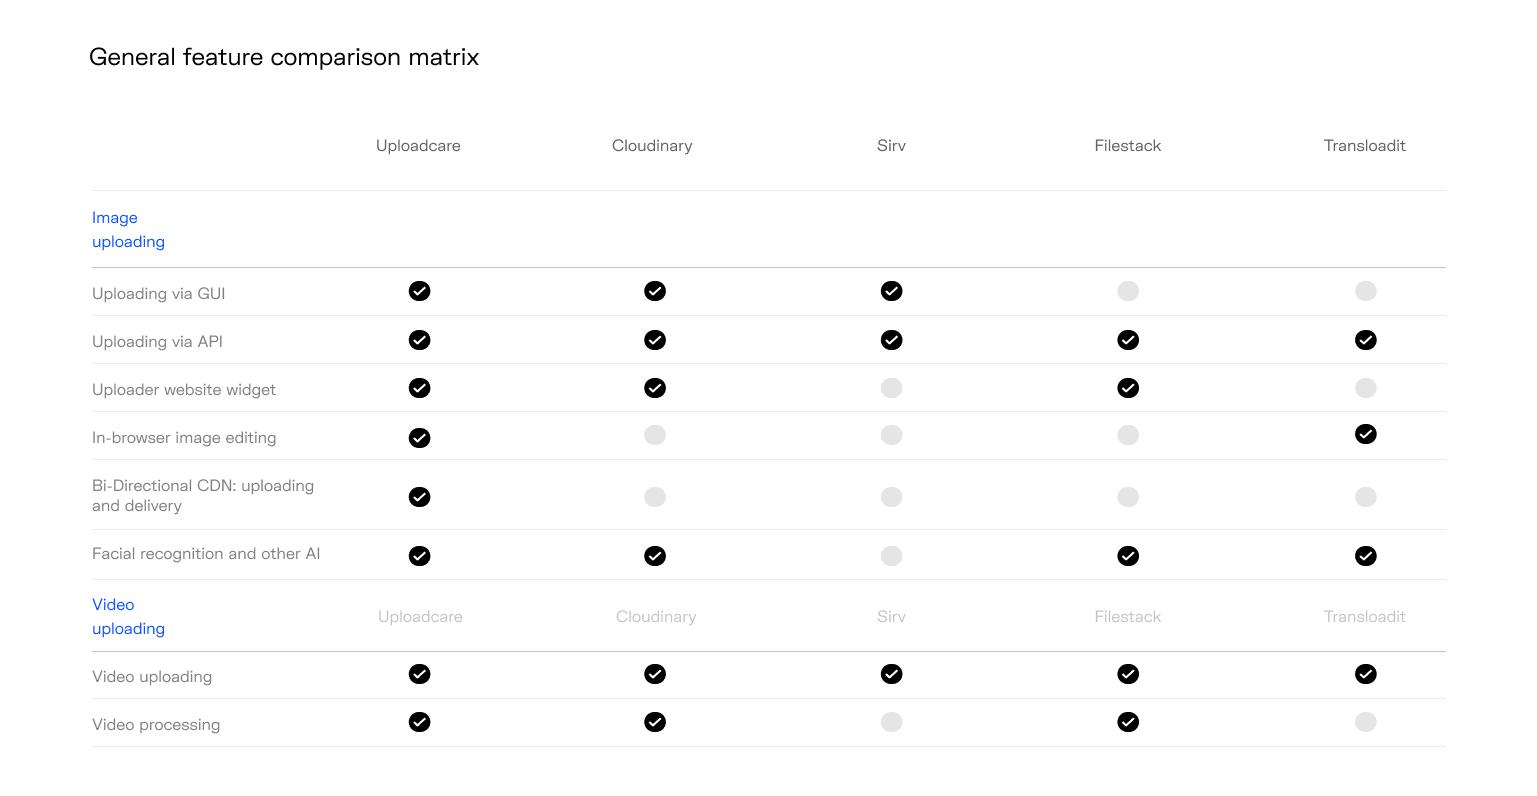 General feature comparison chart